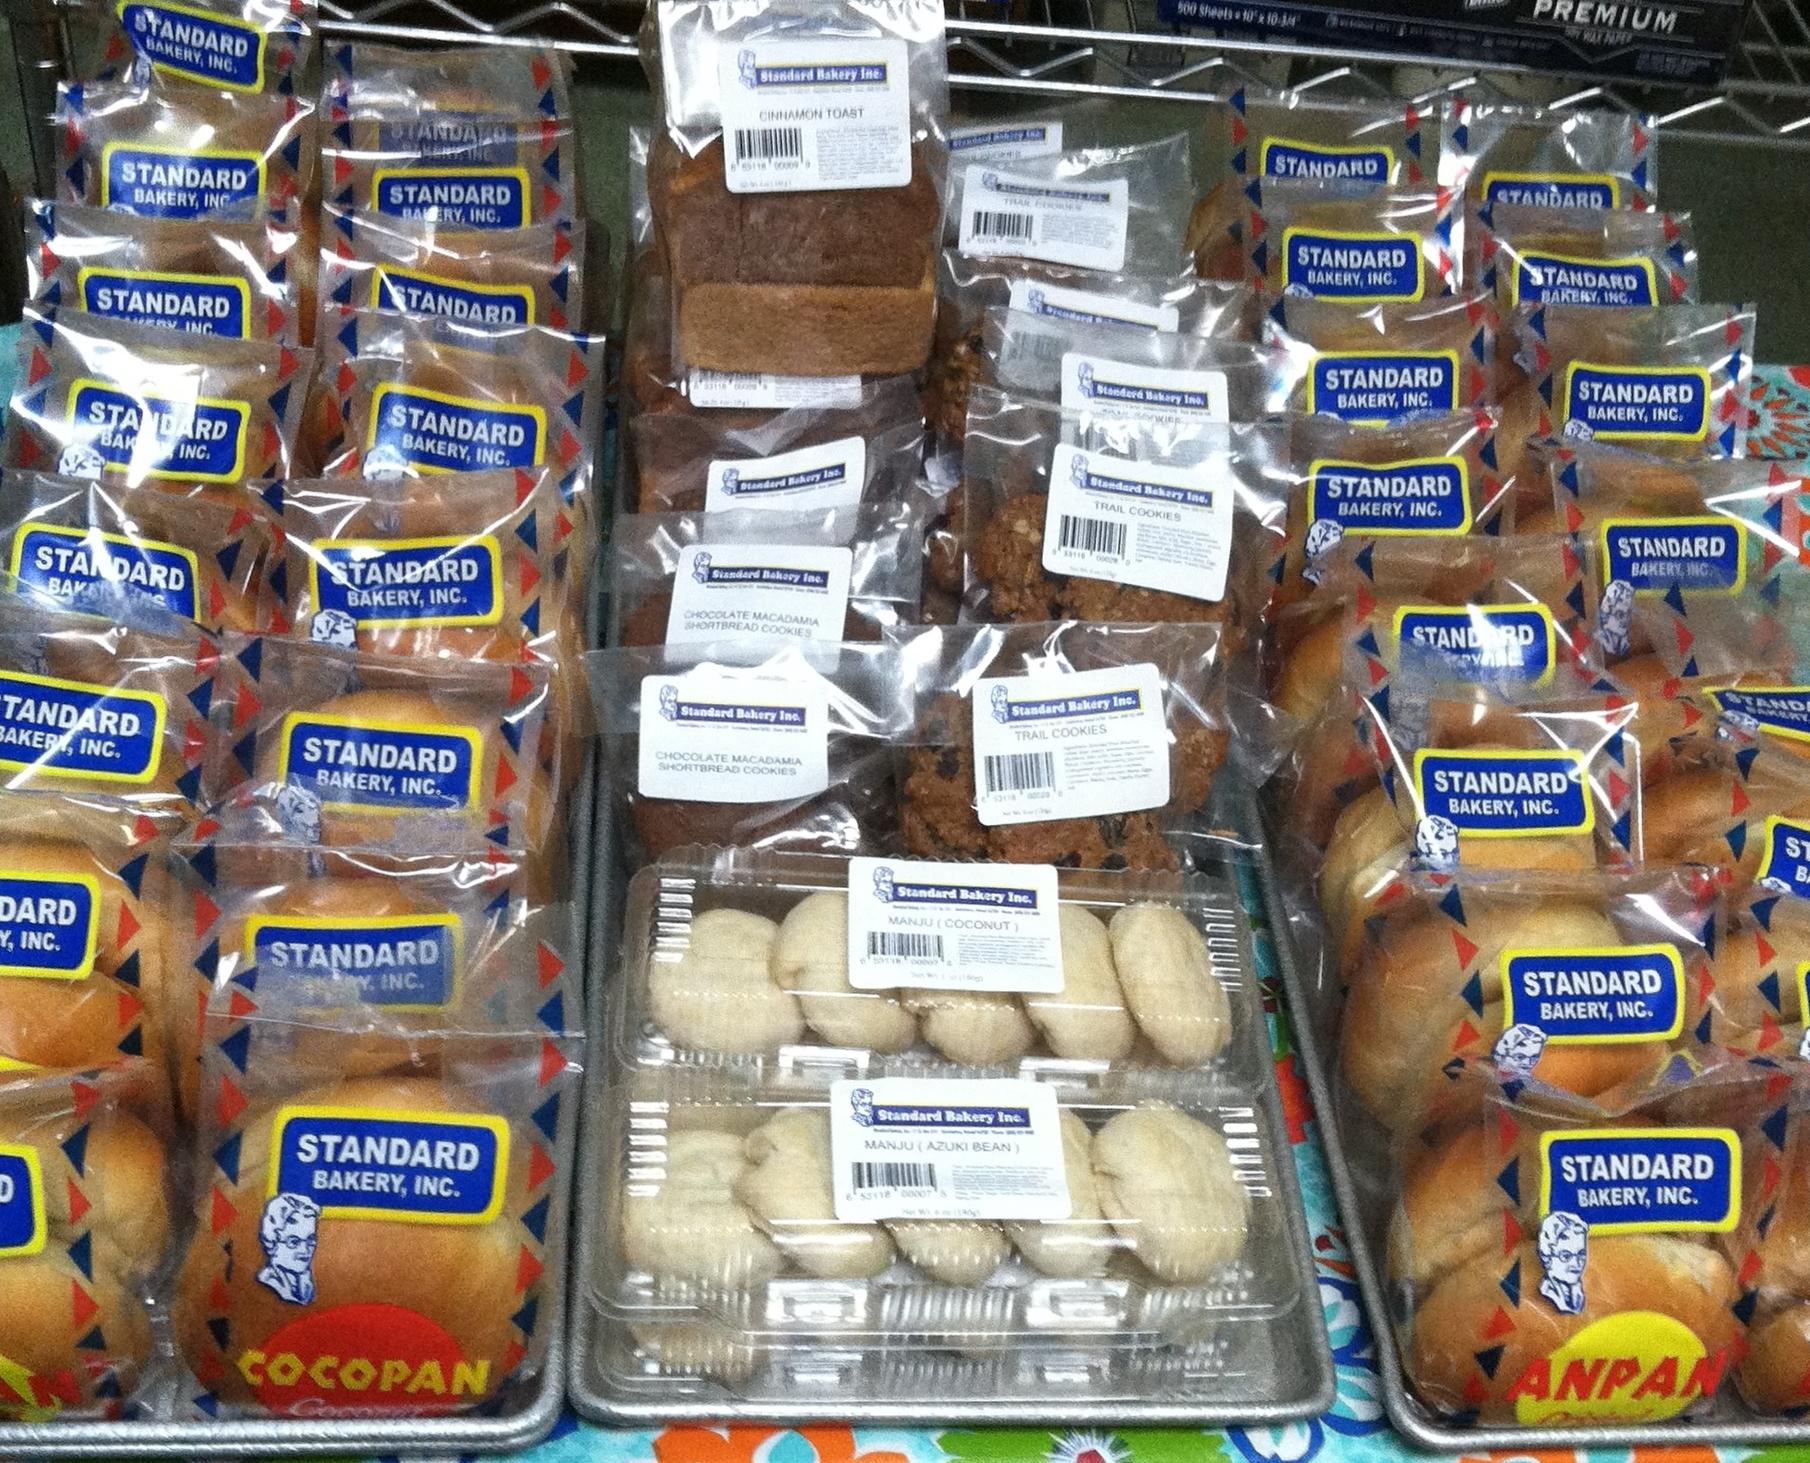 Standard Bakery Inc image 4